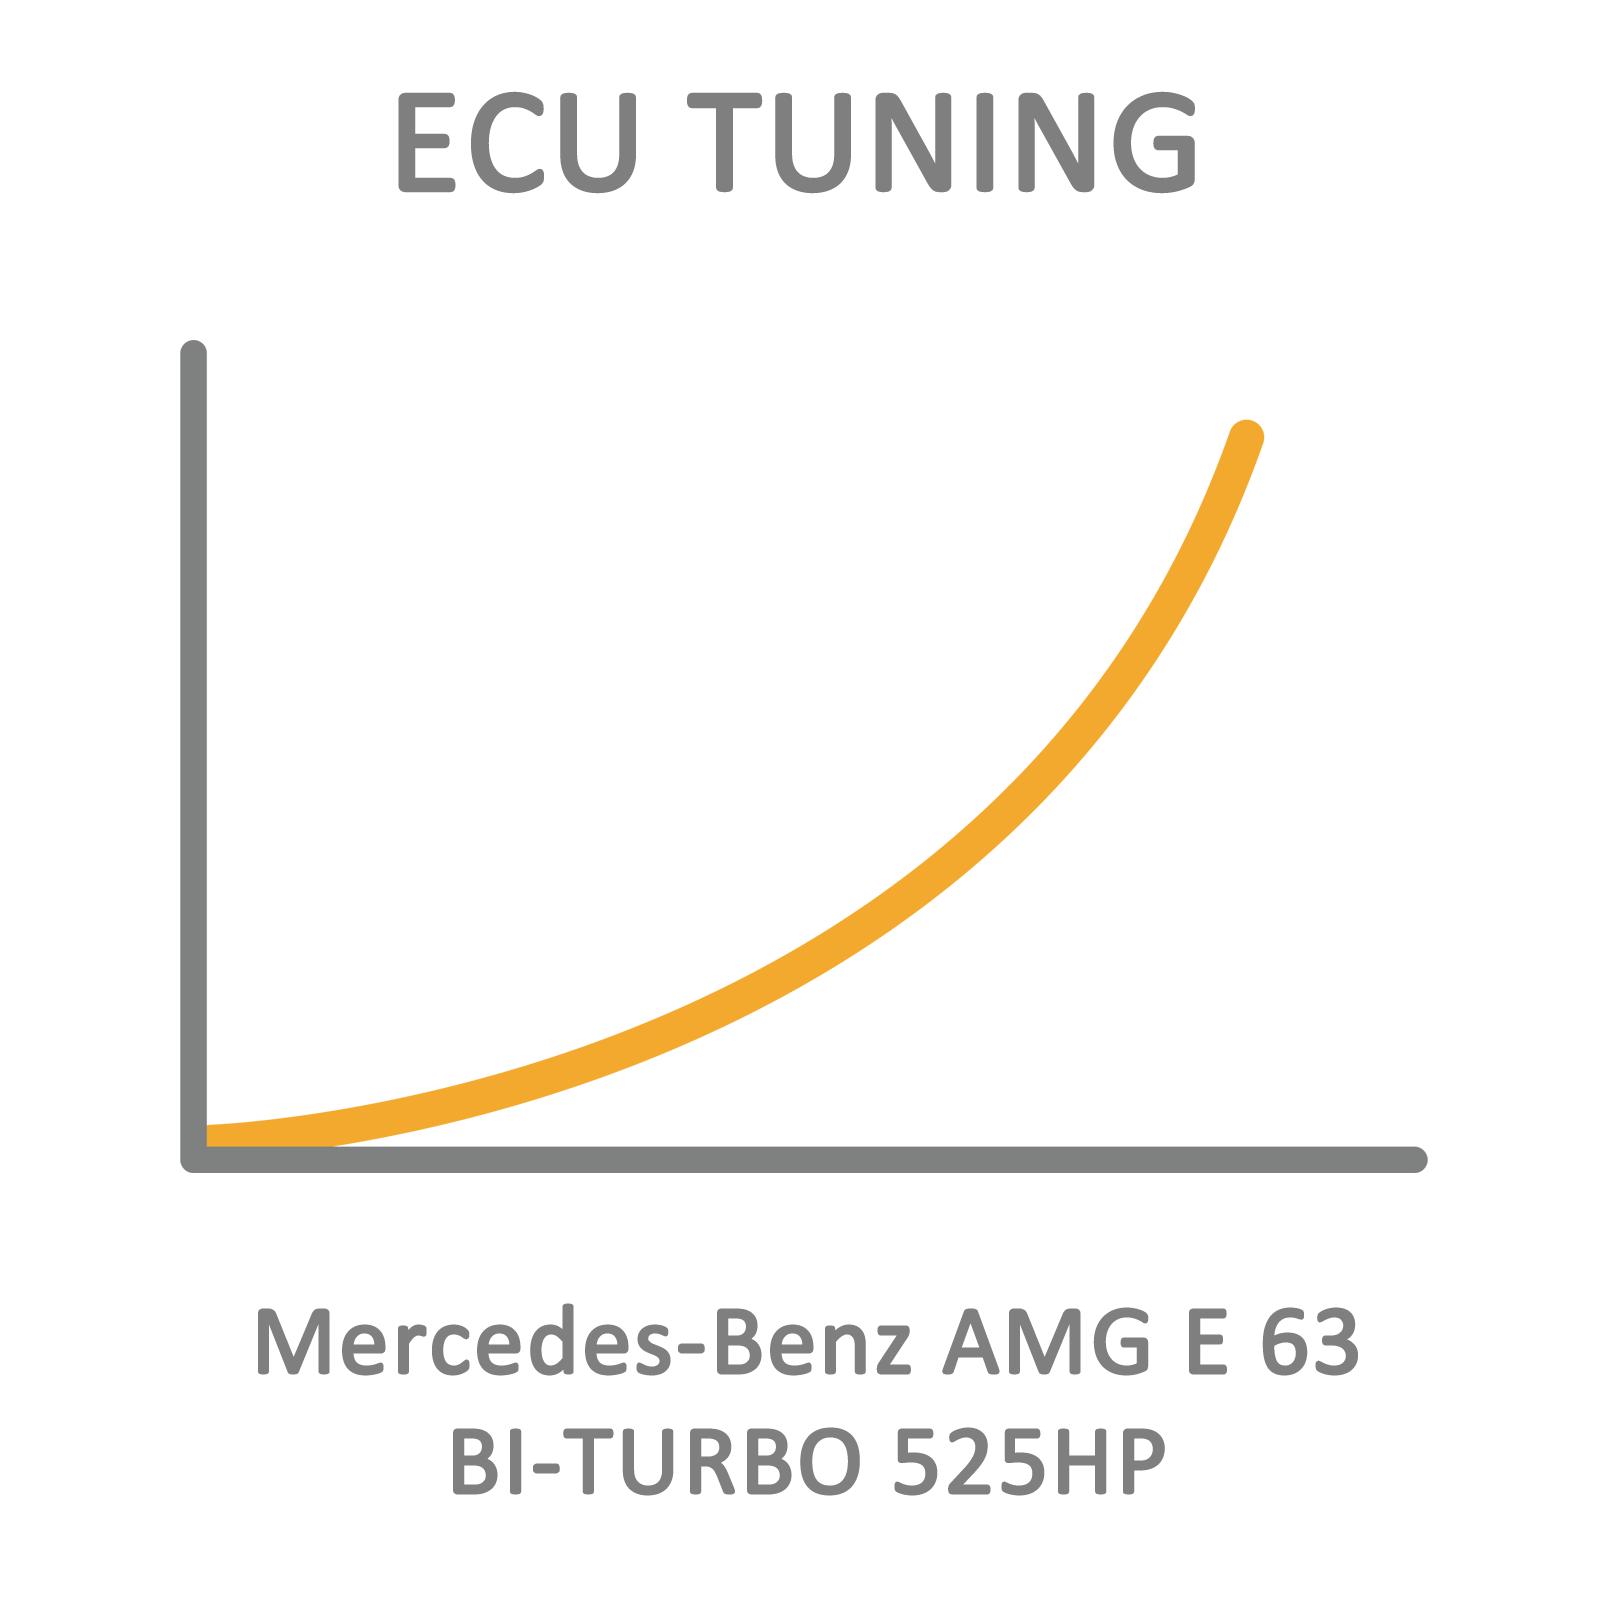 Mercedes-Benz AMG E 63 BI-TURBO 525HP ECU Tuning Remapping